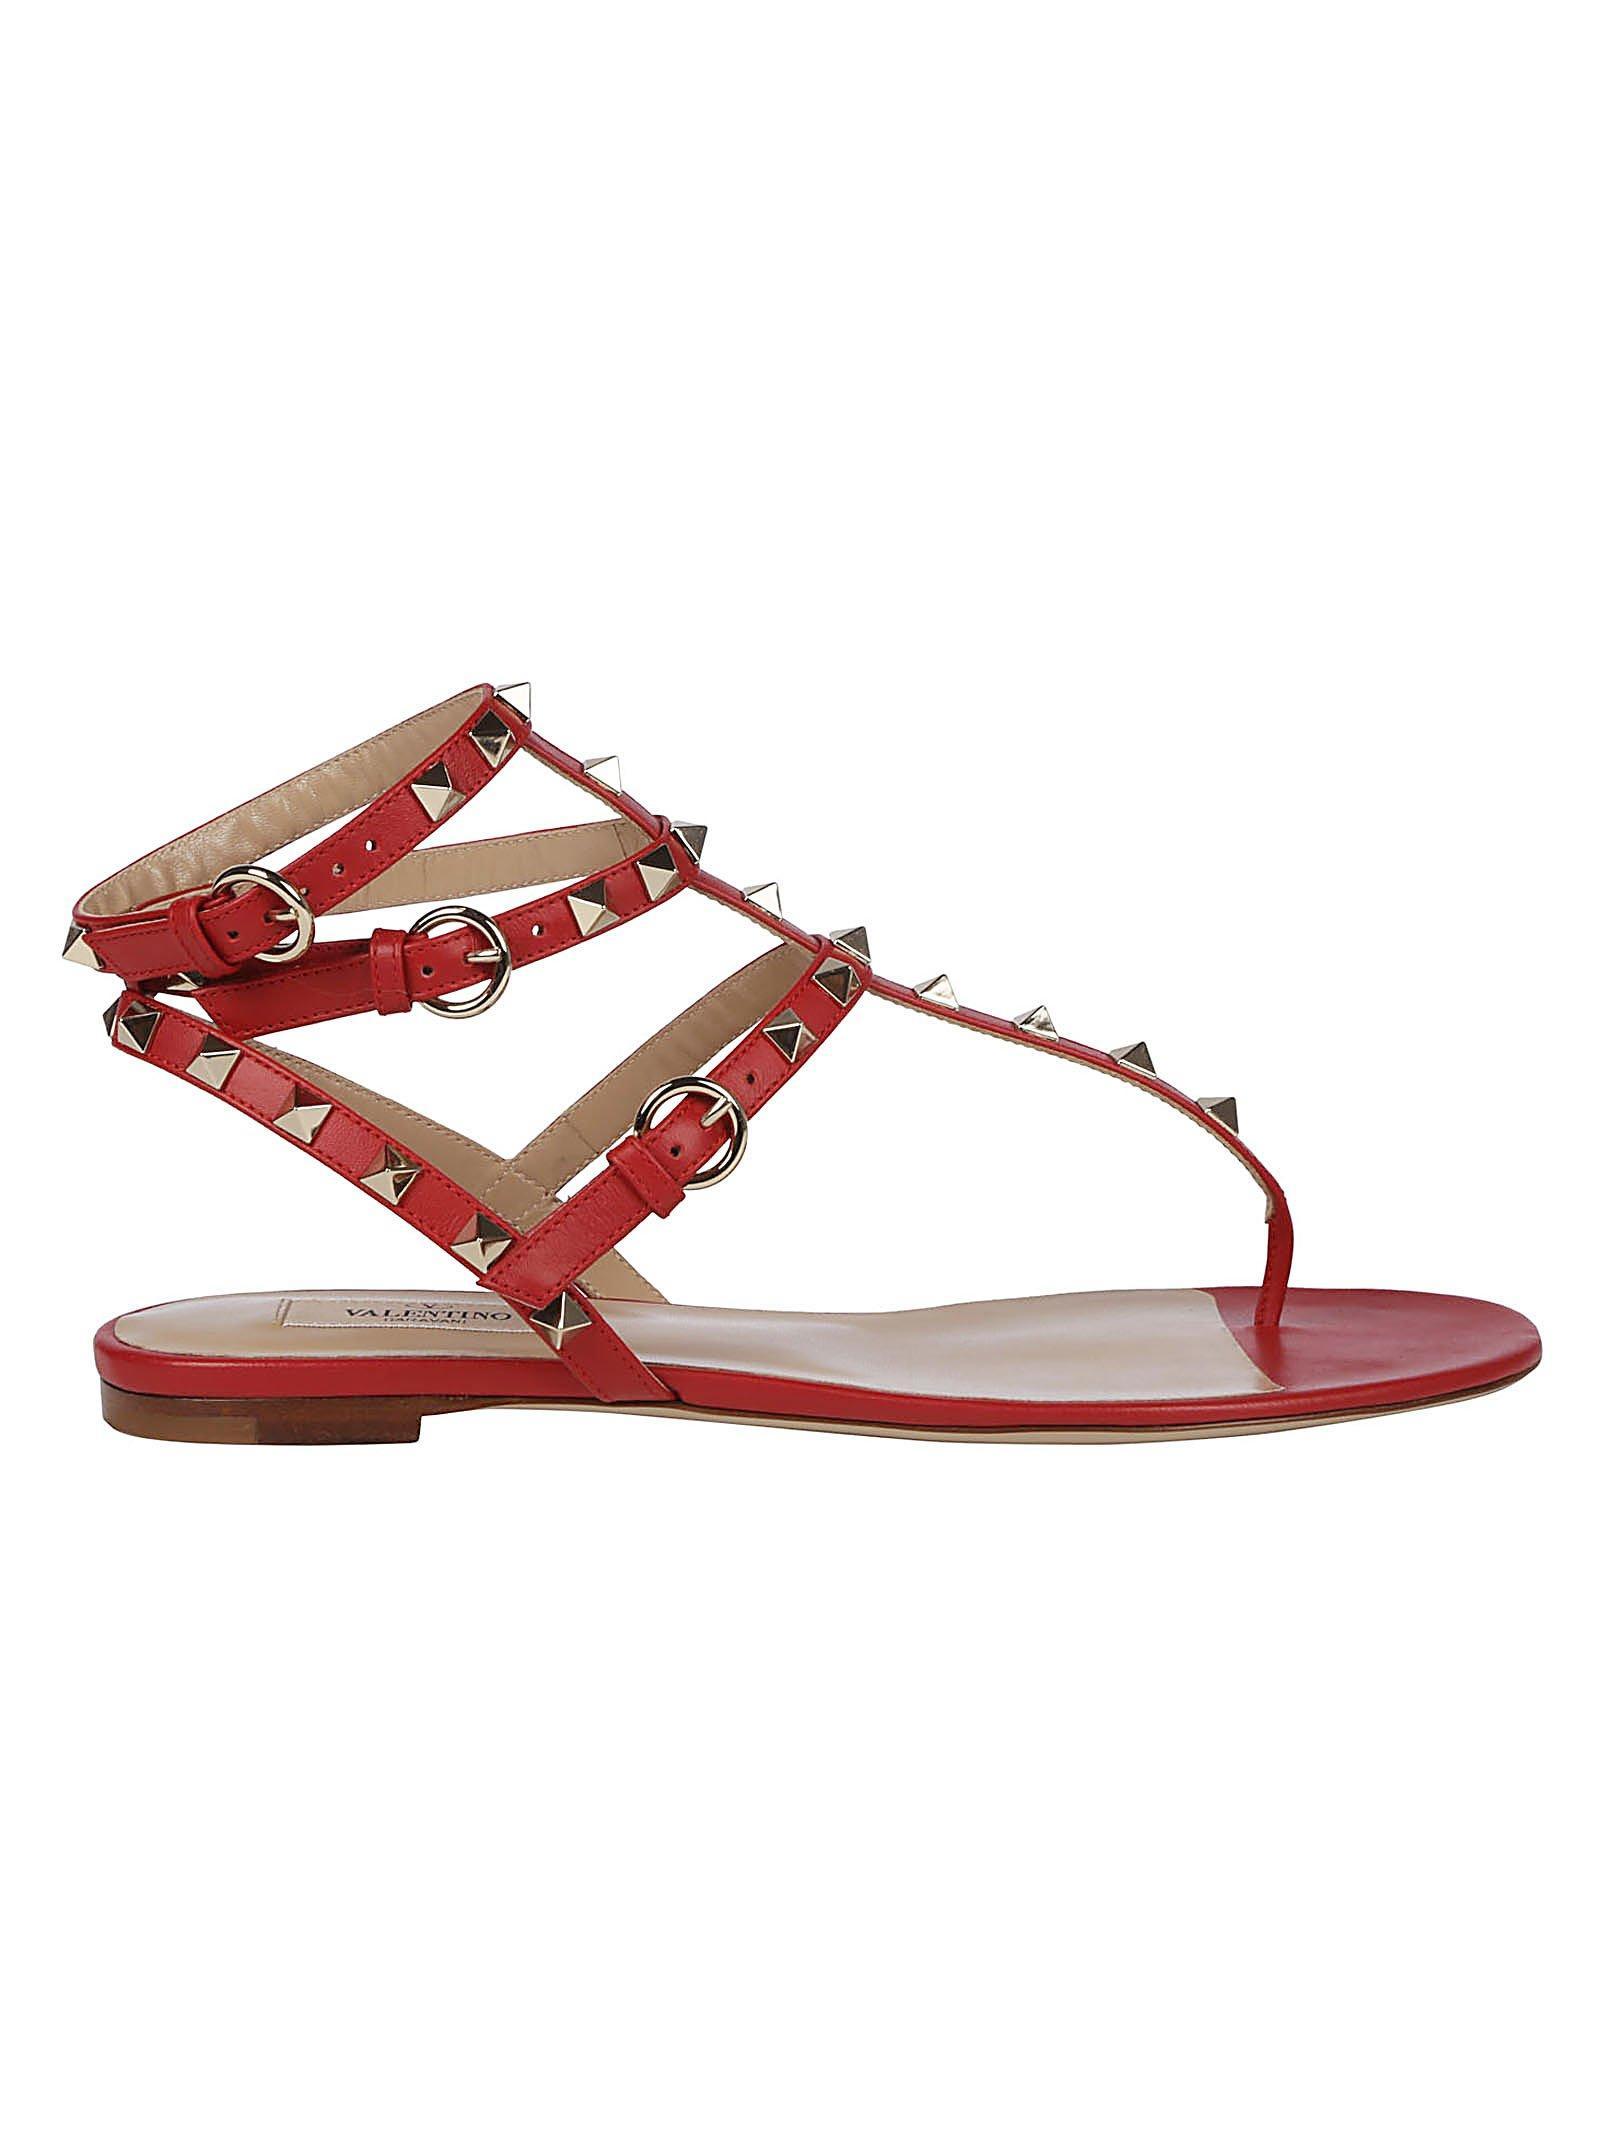 c15cf0aedd830 Valentino - Red Garavani Rockstud Strappy Sandals - Lyst. View fullscreen